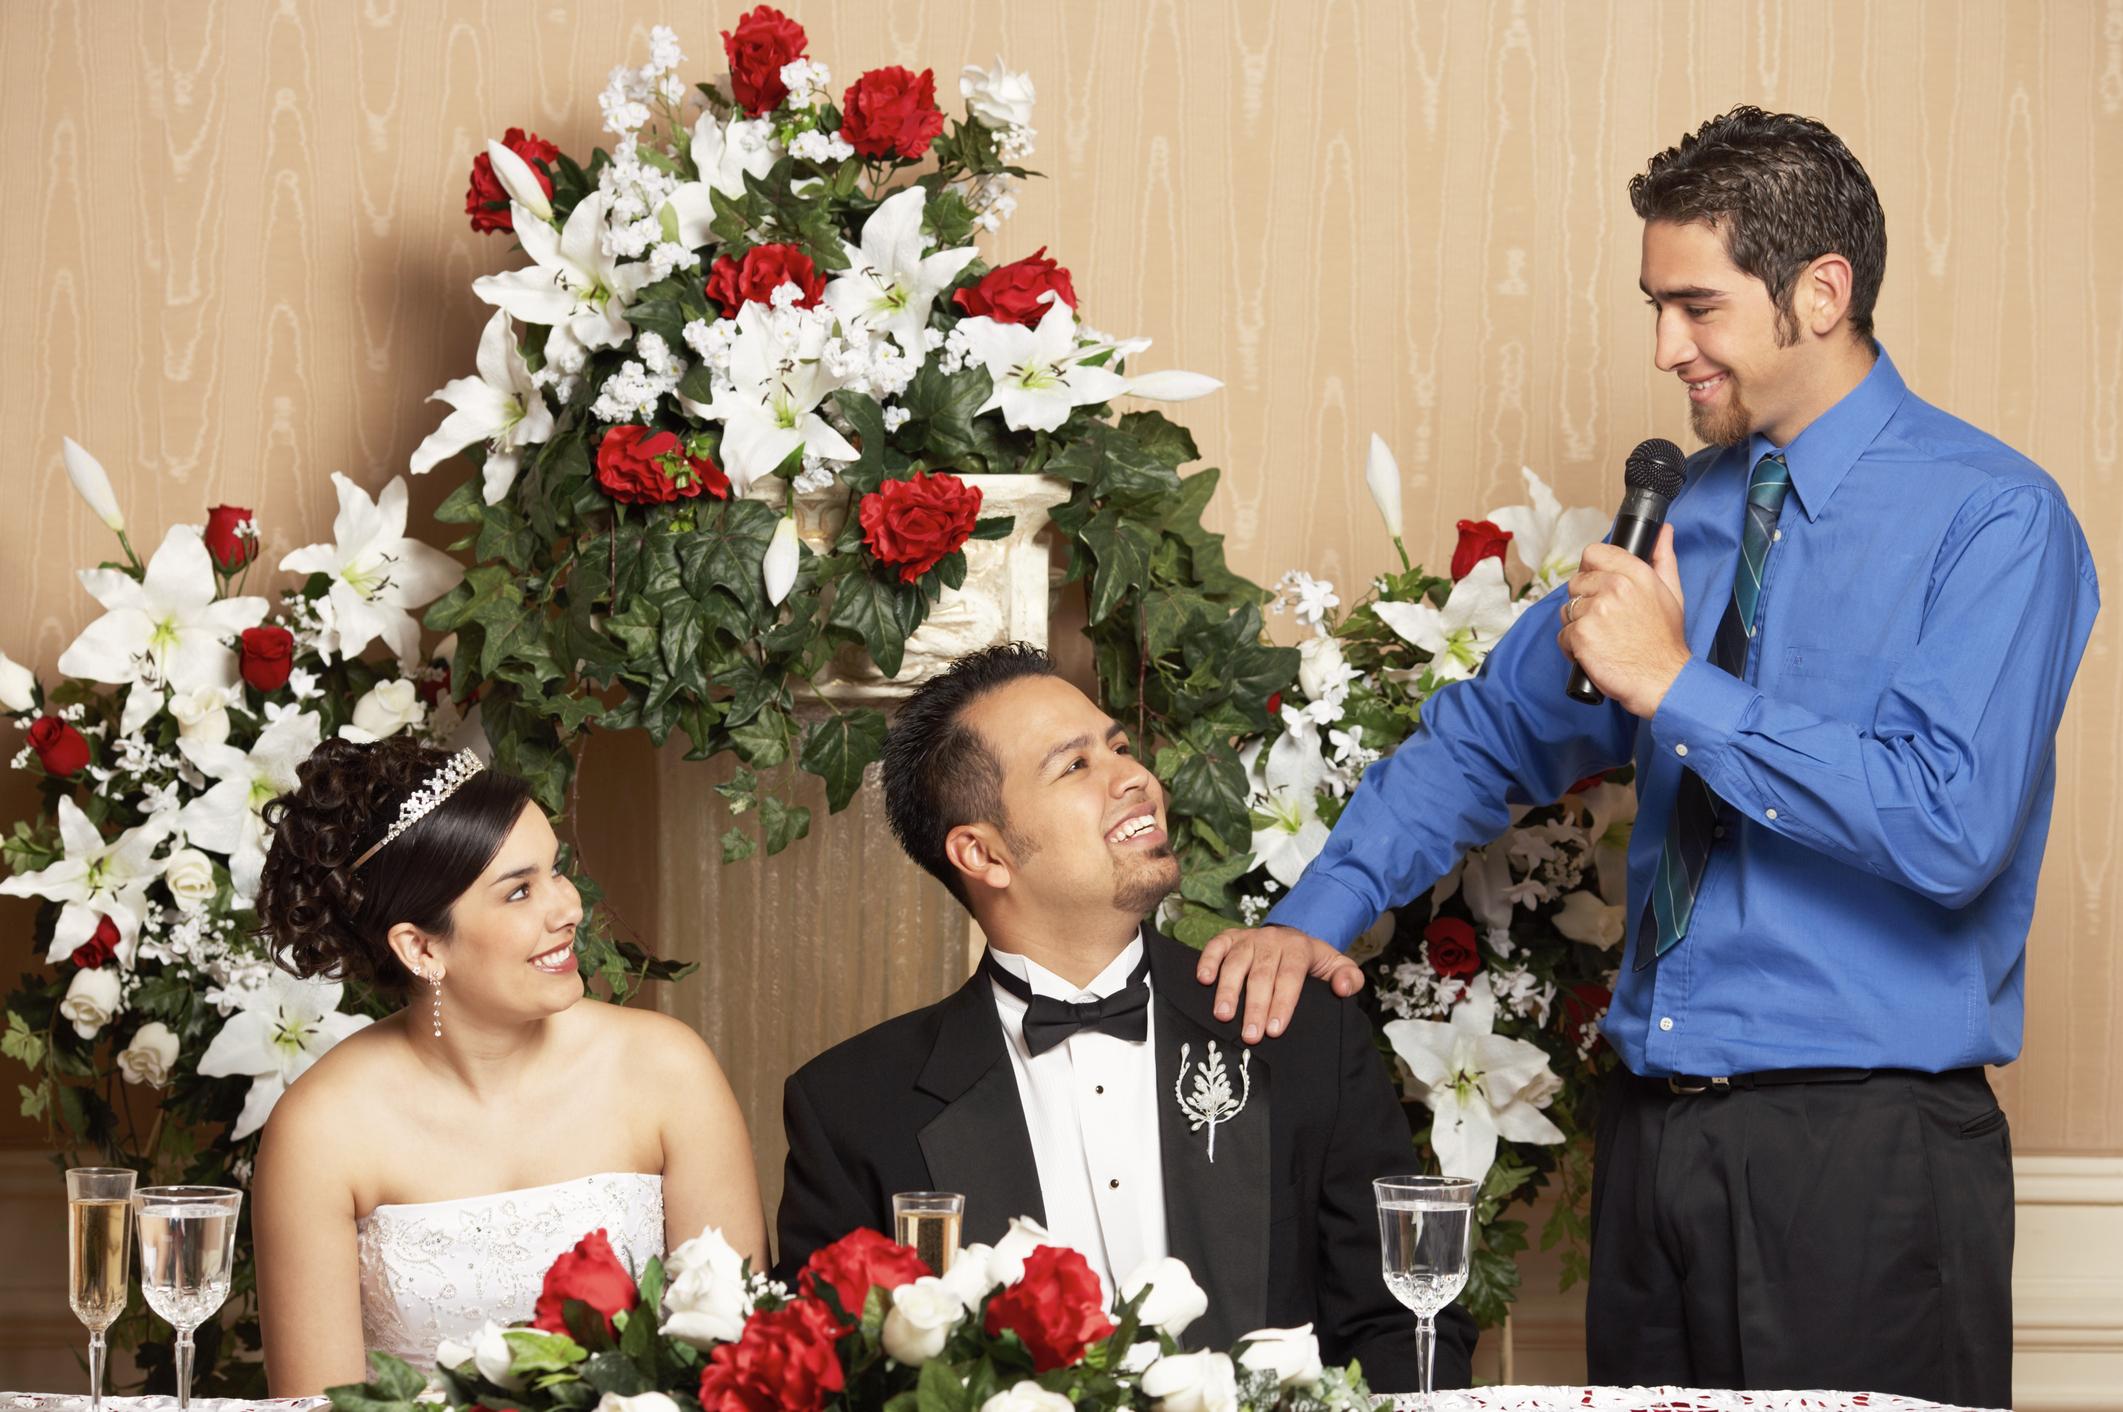 Best Man Wedding Toast Examples   LoveToKnow